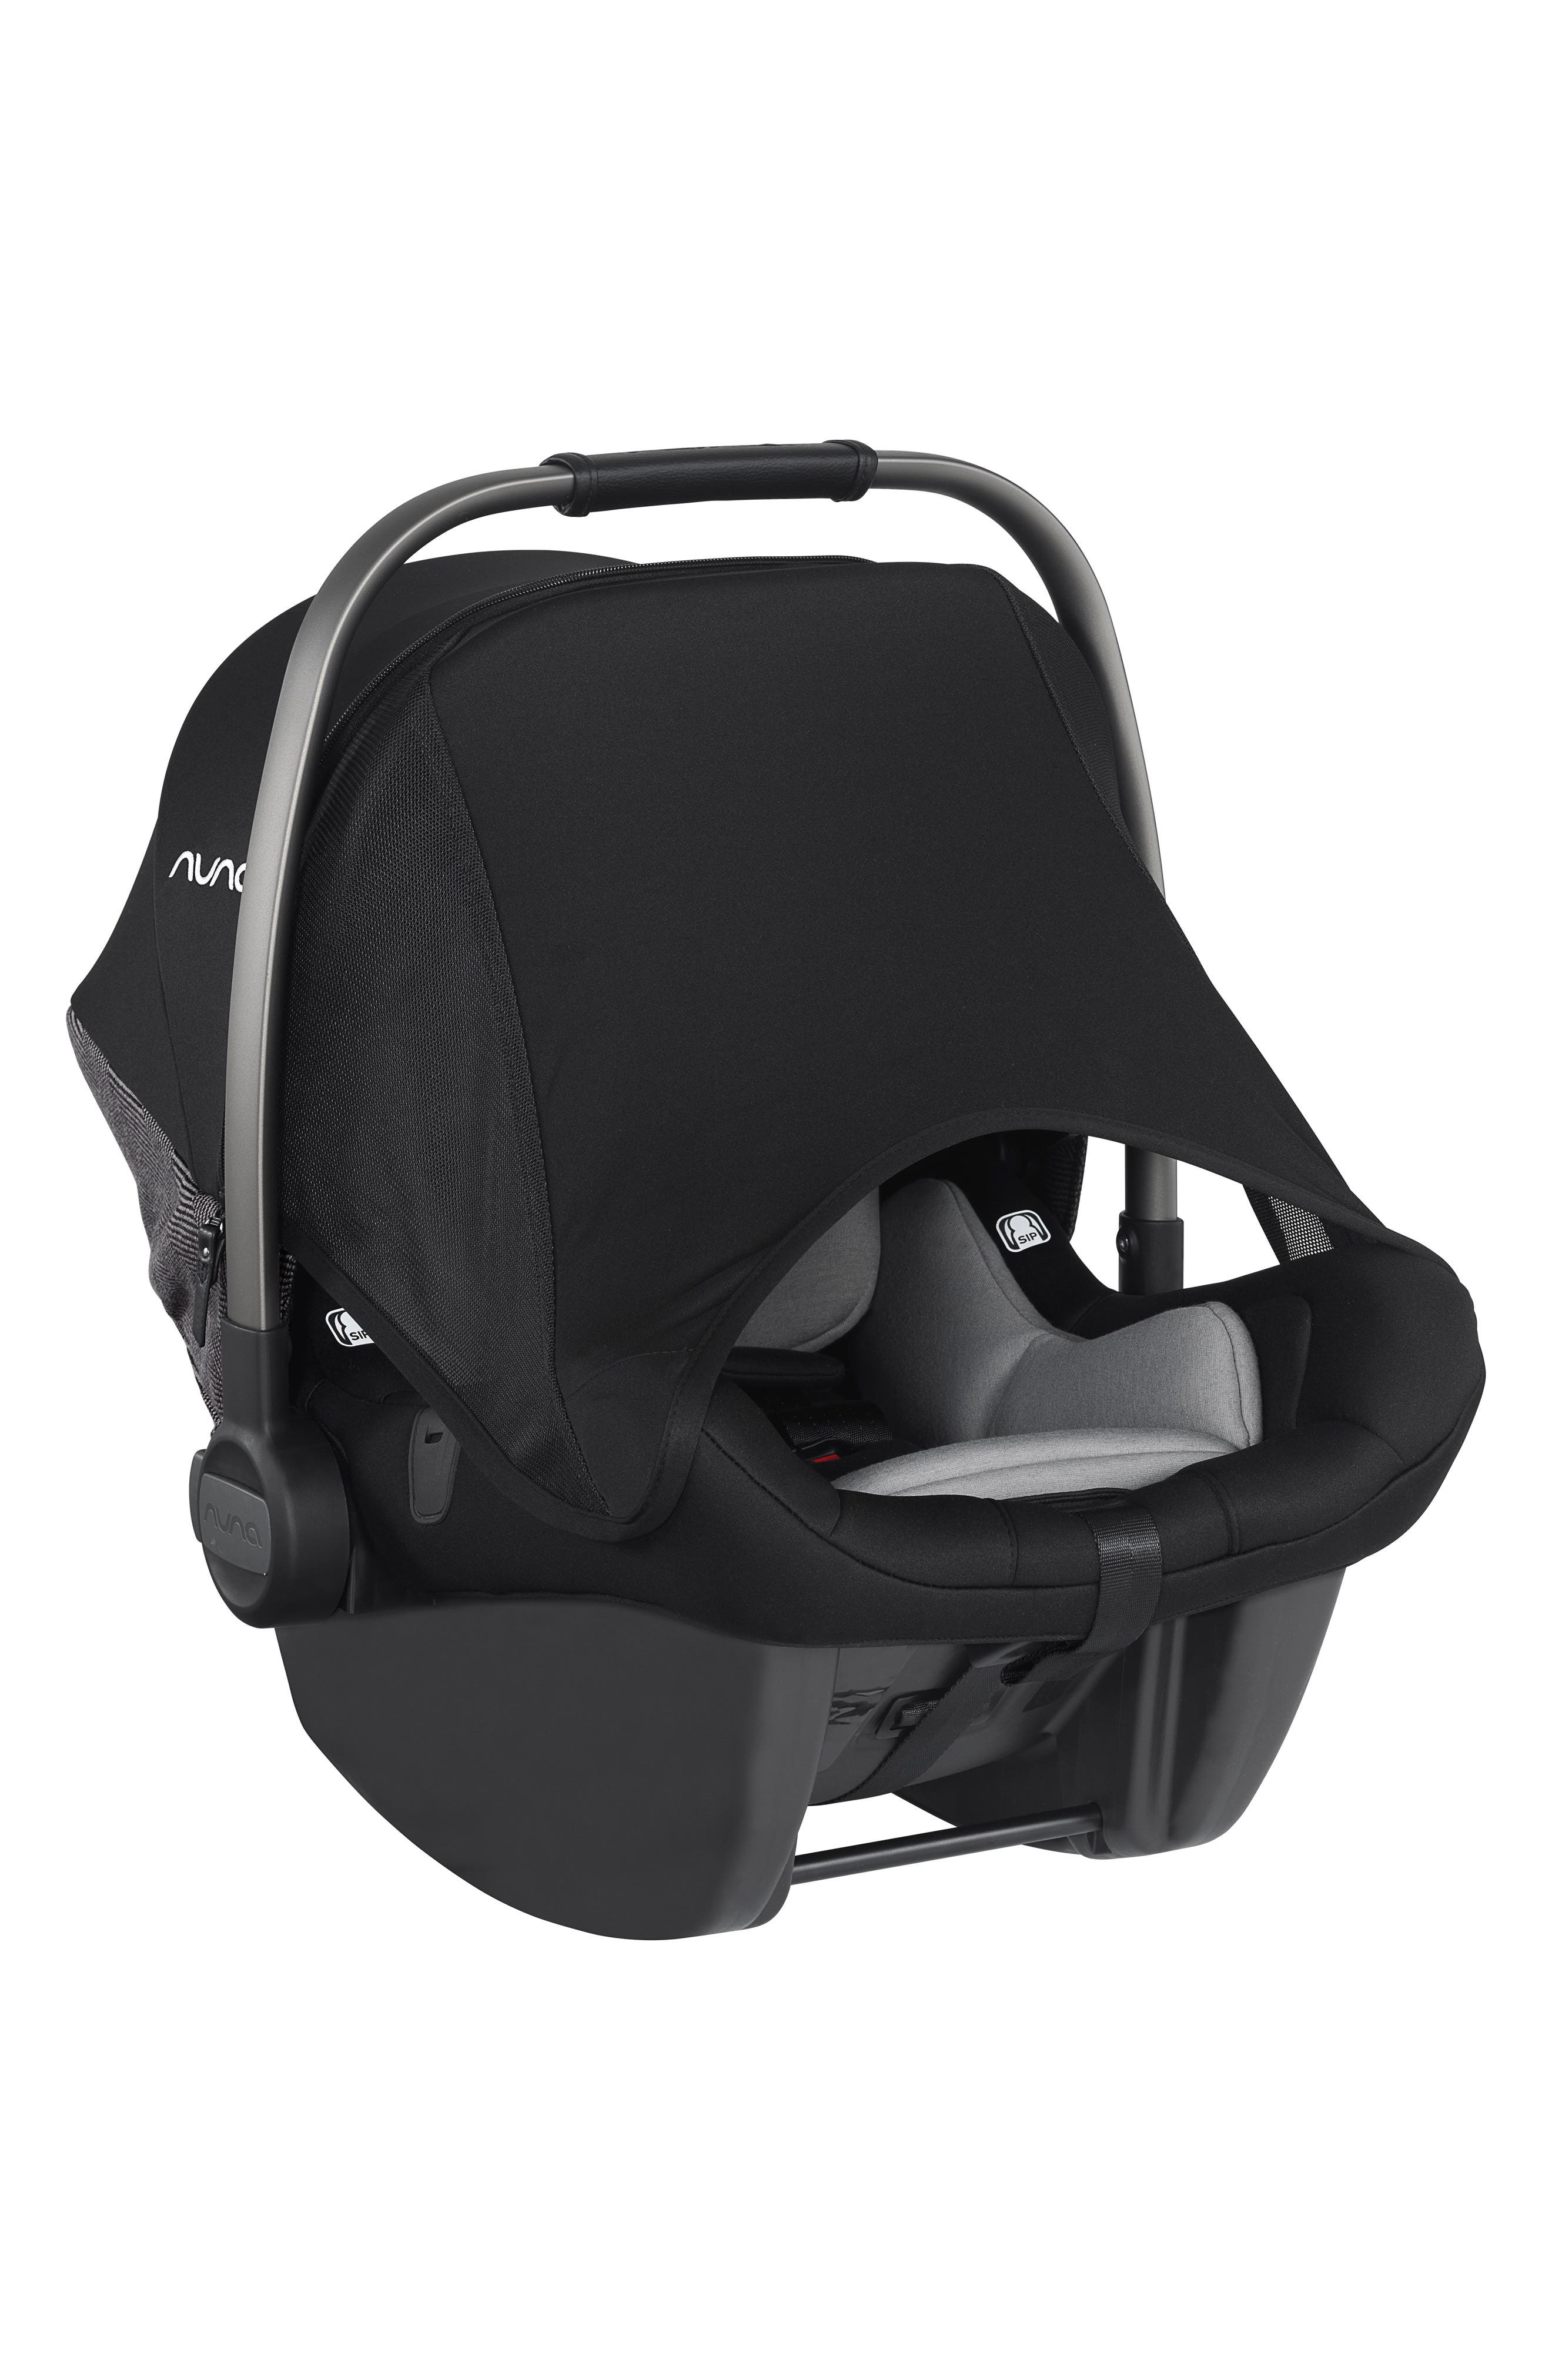 2019 MIXX<sup>™</sup> Stroller & PIPA<sup>™</sup> Lite LX Infant Car Seat Set Travel System,                             Alternate thumbnail 15, color,                             Verona Caviar